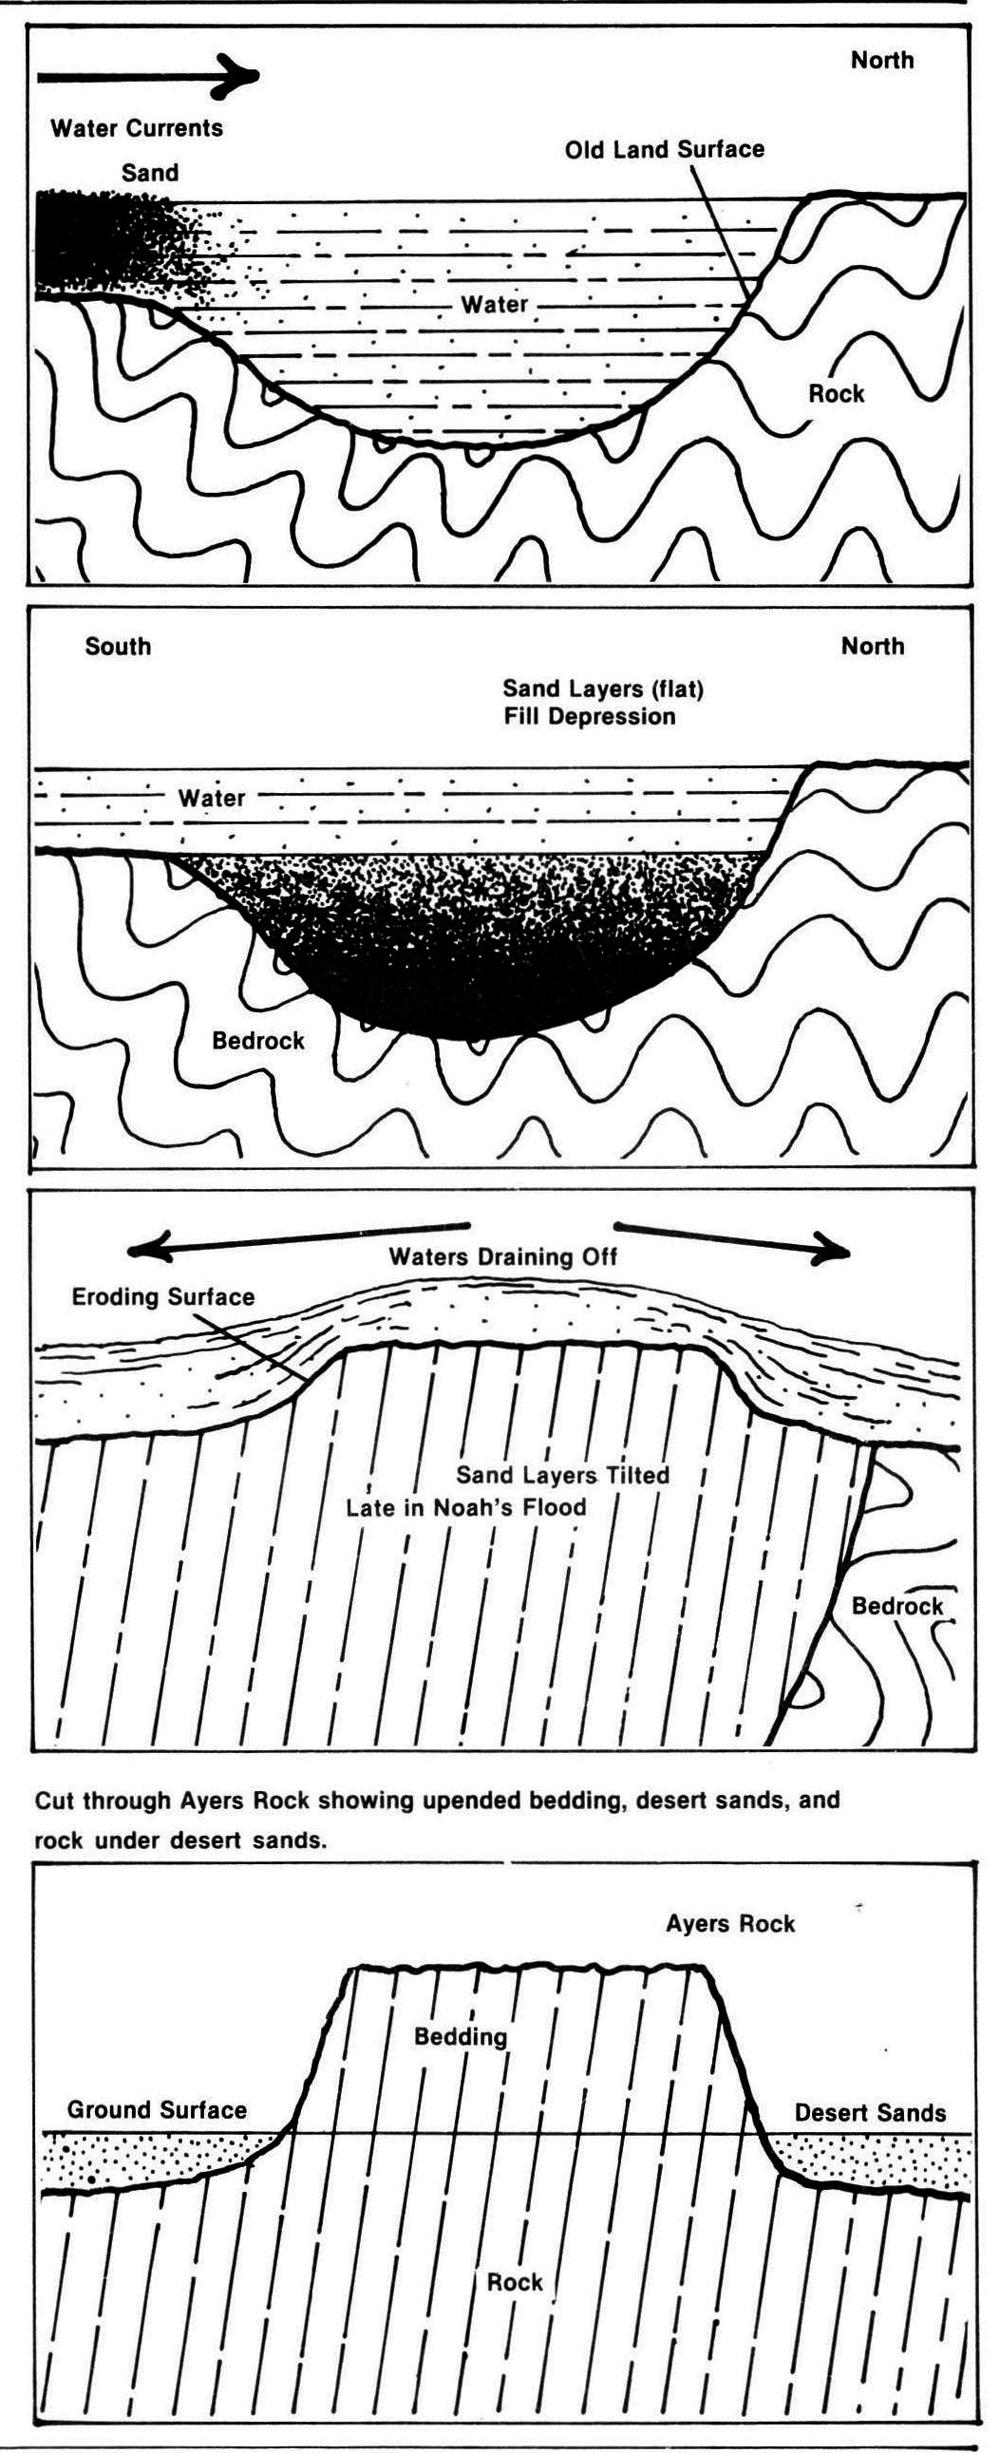 Ayers Rock Geology Ayers-rock